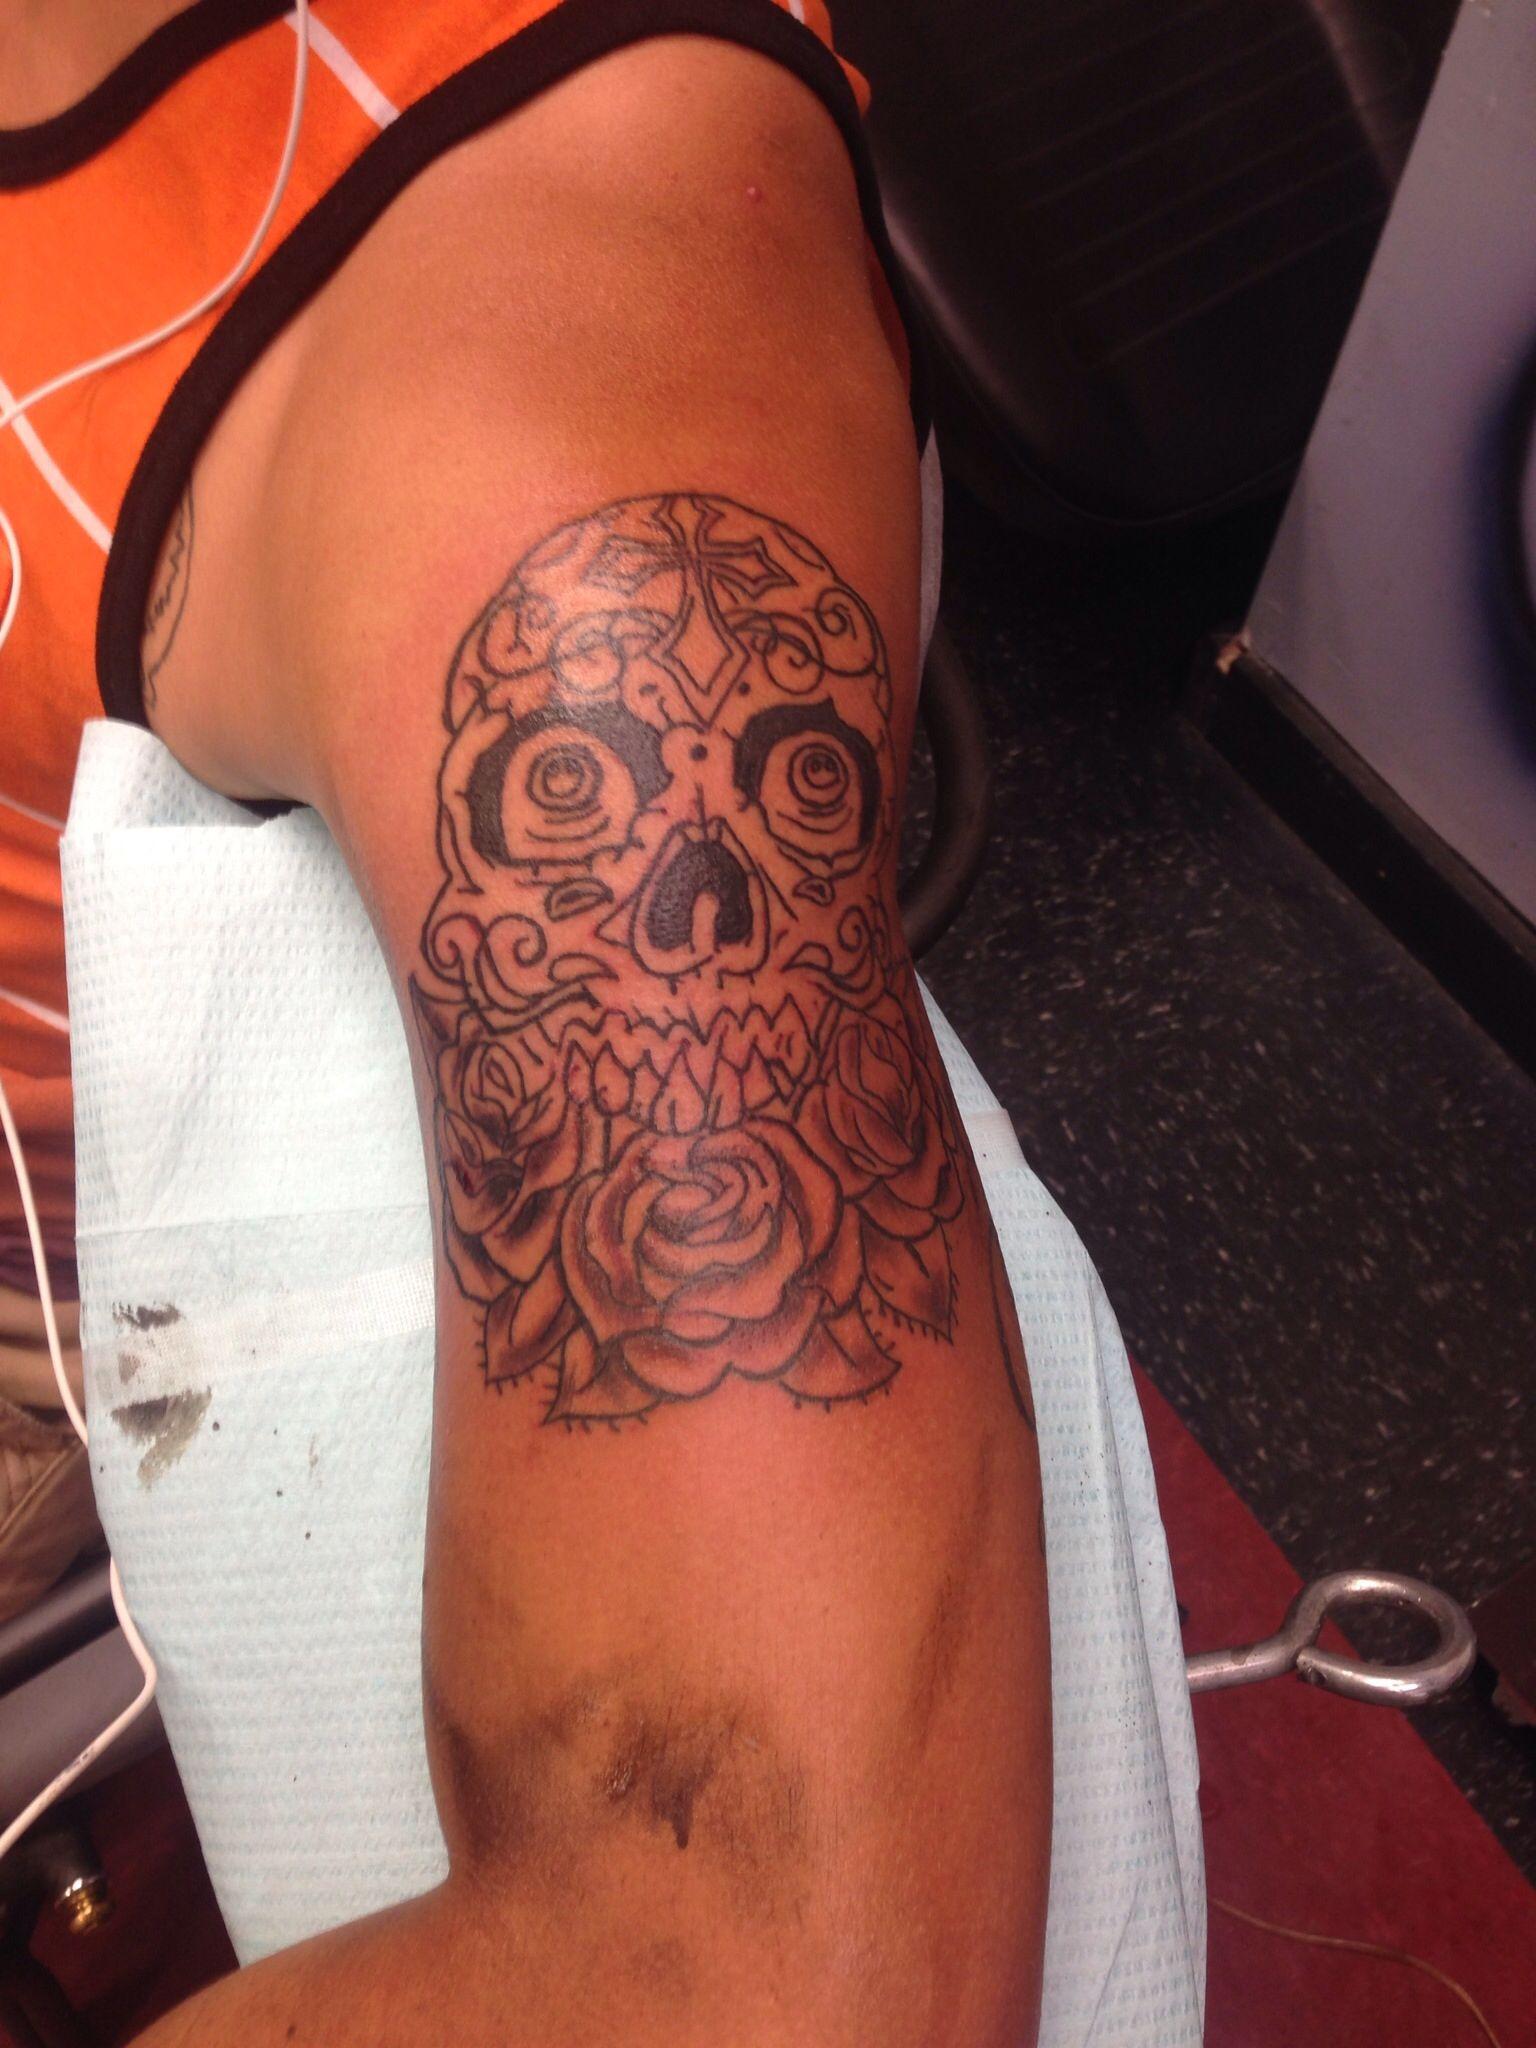 Beauty is pain! #sugarskull #art #tattoosforguys #tattoos for men #shading #likeforme